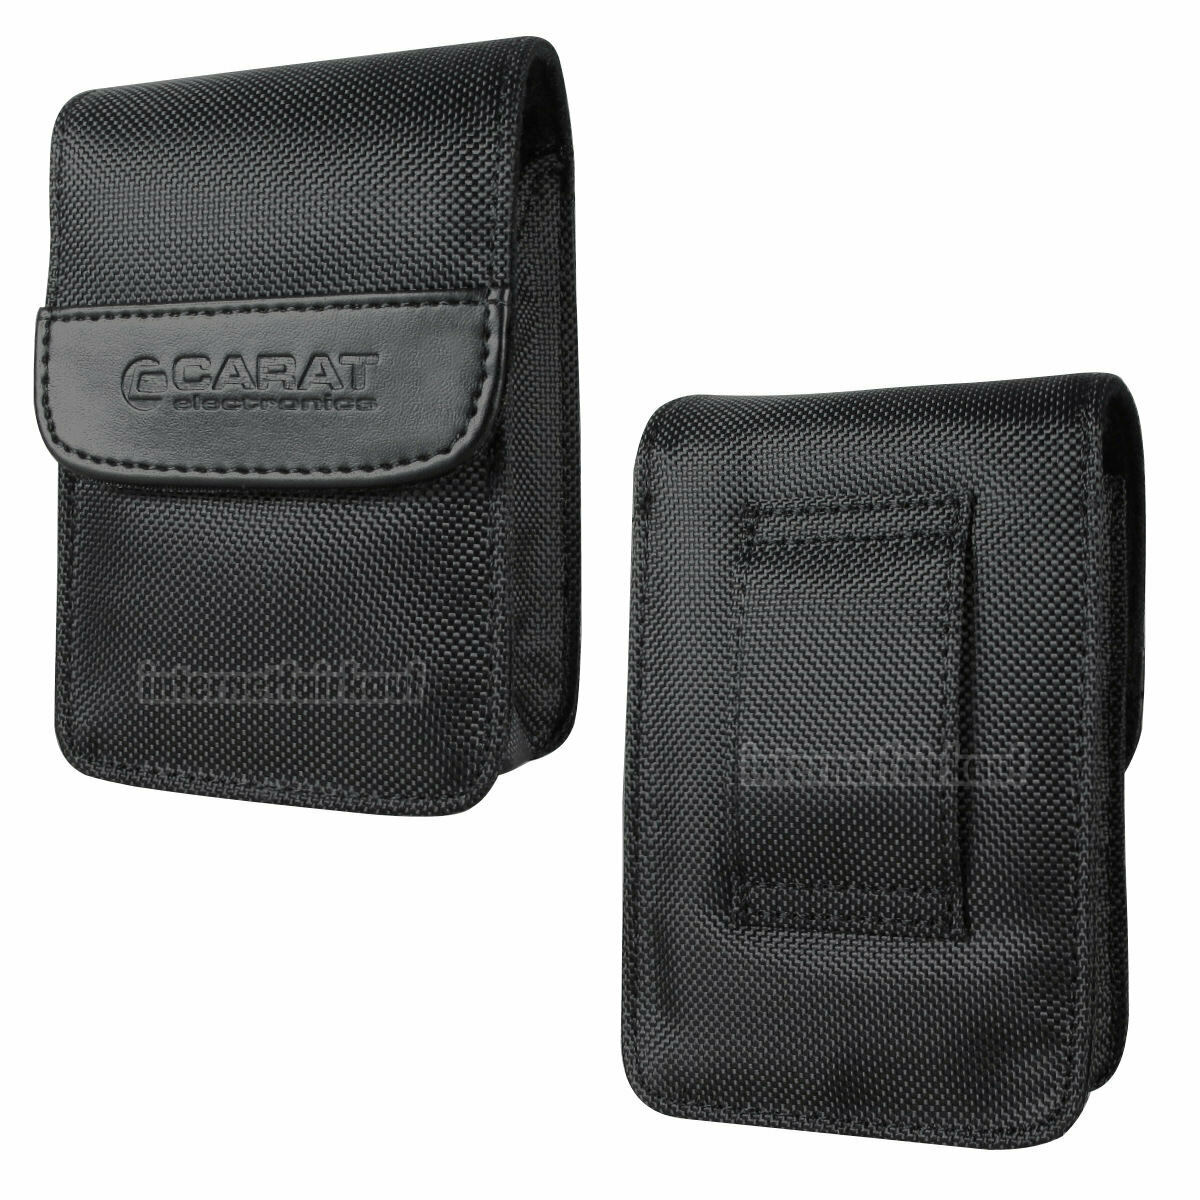 Kameratasche passend für Panasonic Lumix DC-TZ18 TZ22 TZ25 - Etui